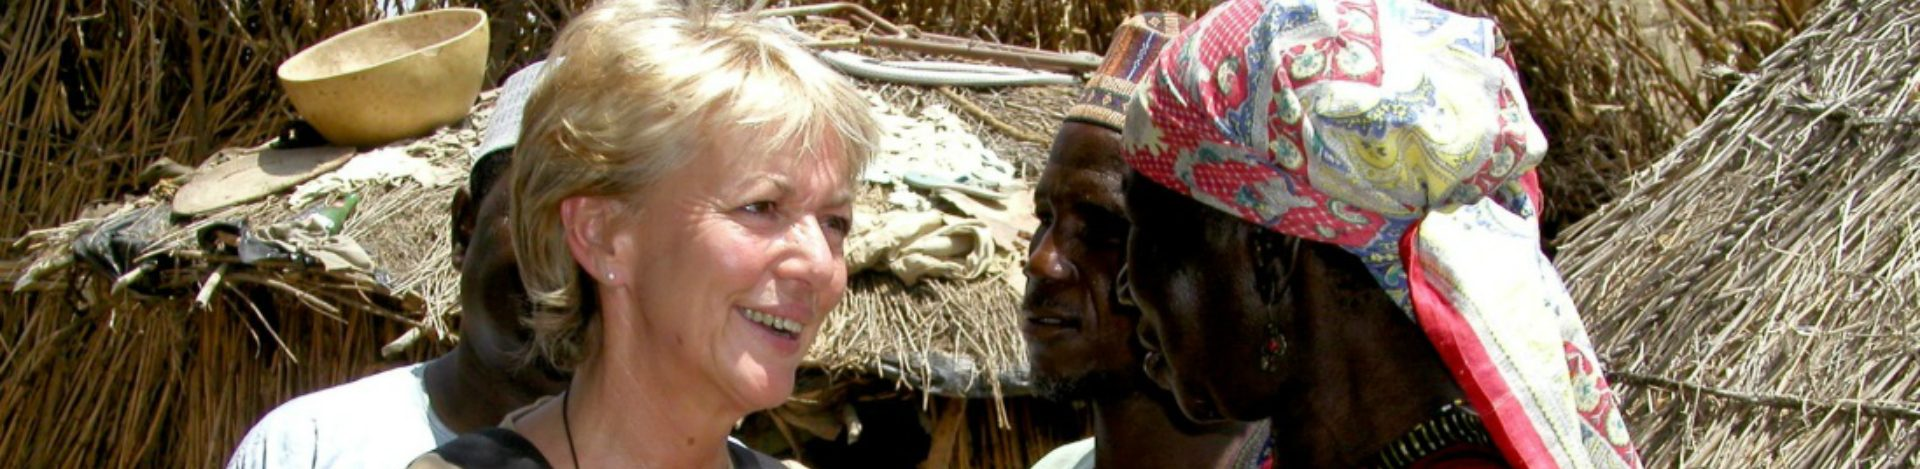 Trudie Goodwin speaking to Cataract patient in Nigeria.